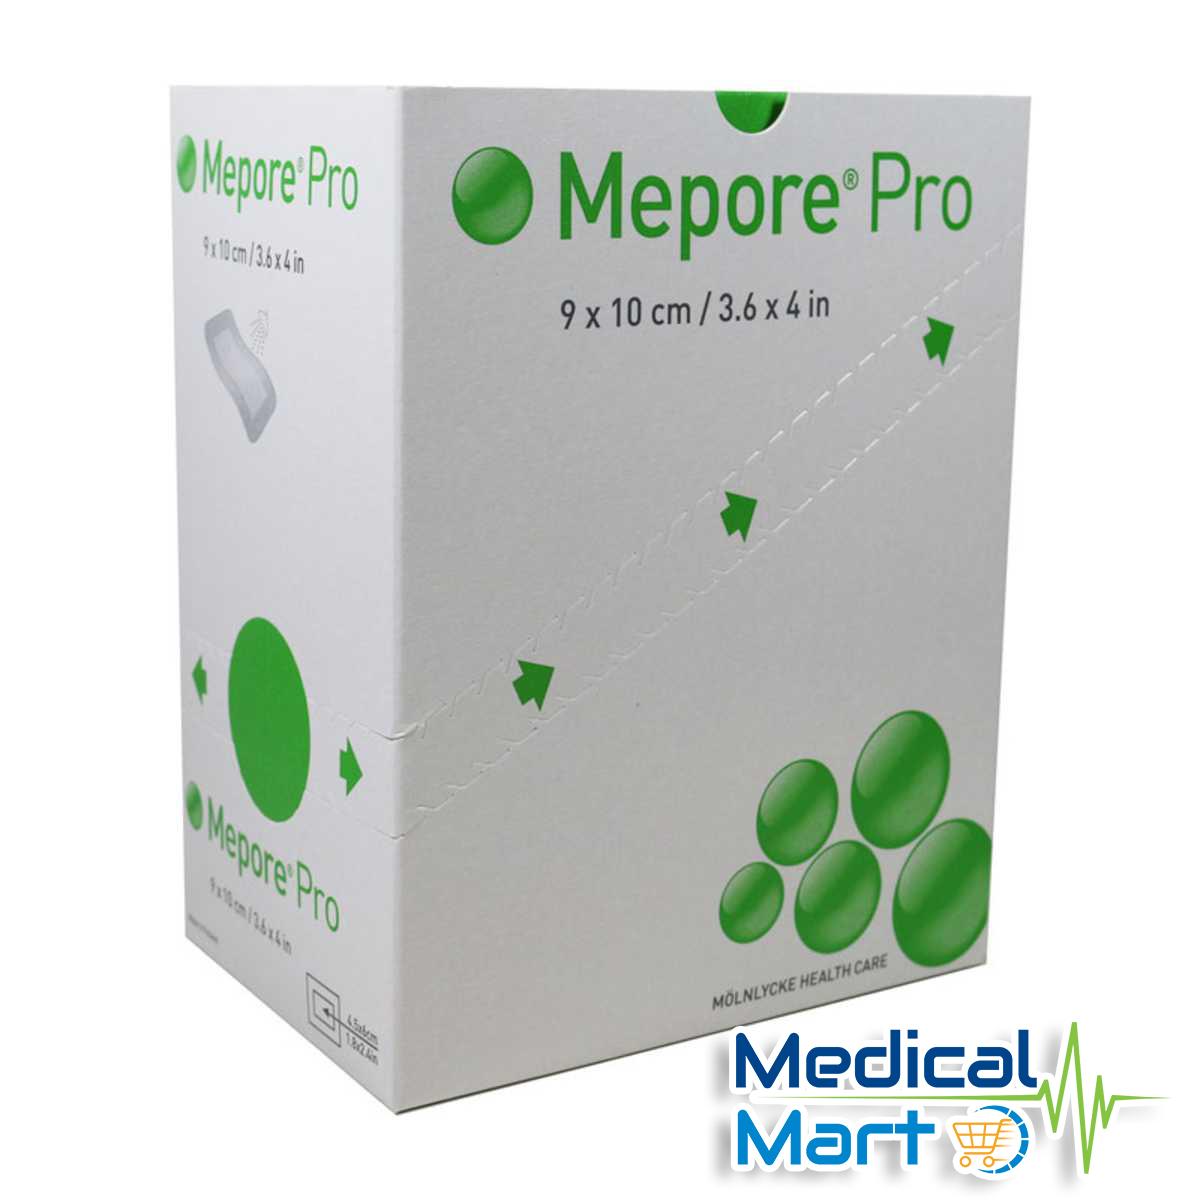 Mepore Pro 9cm x 10cm